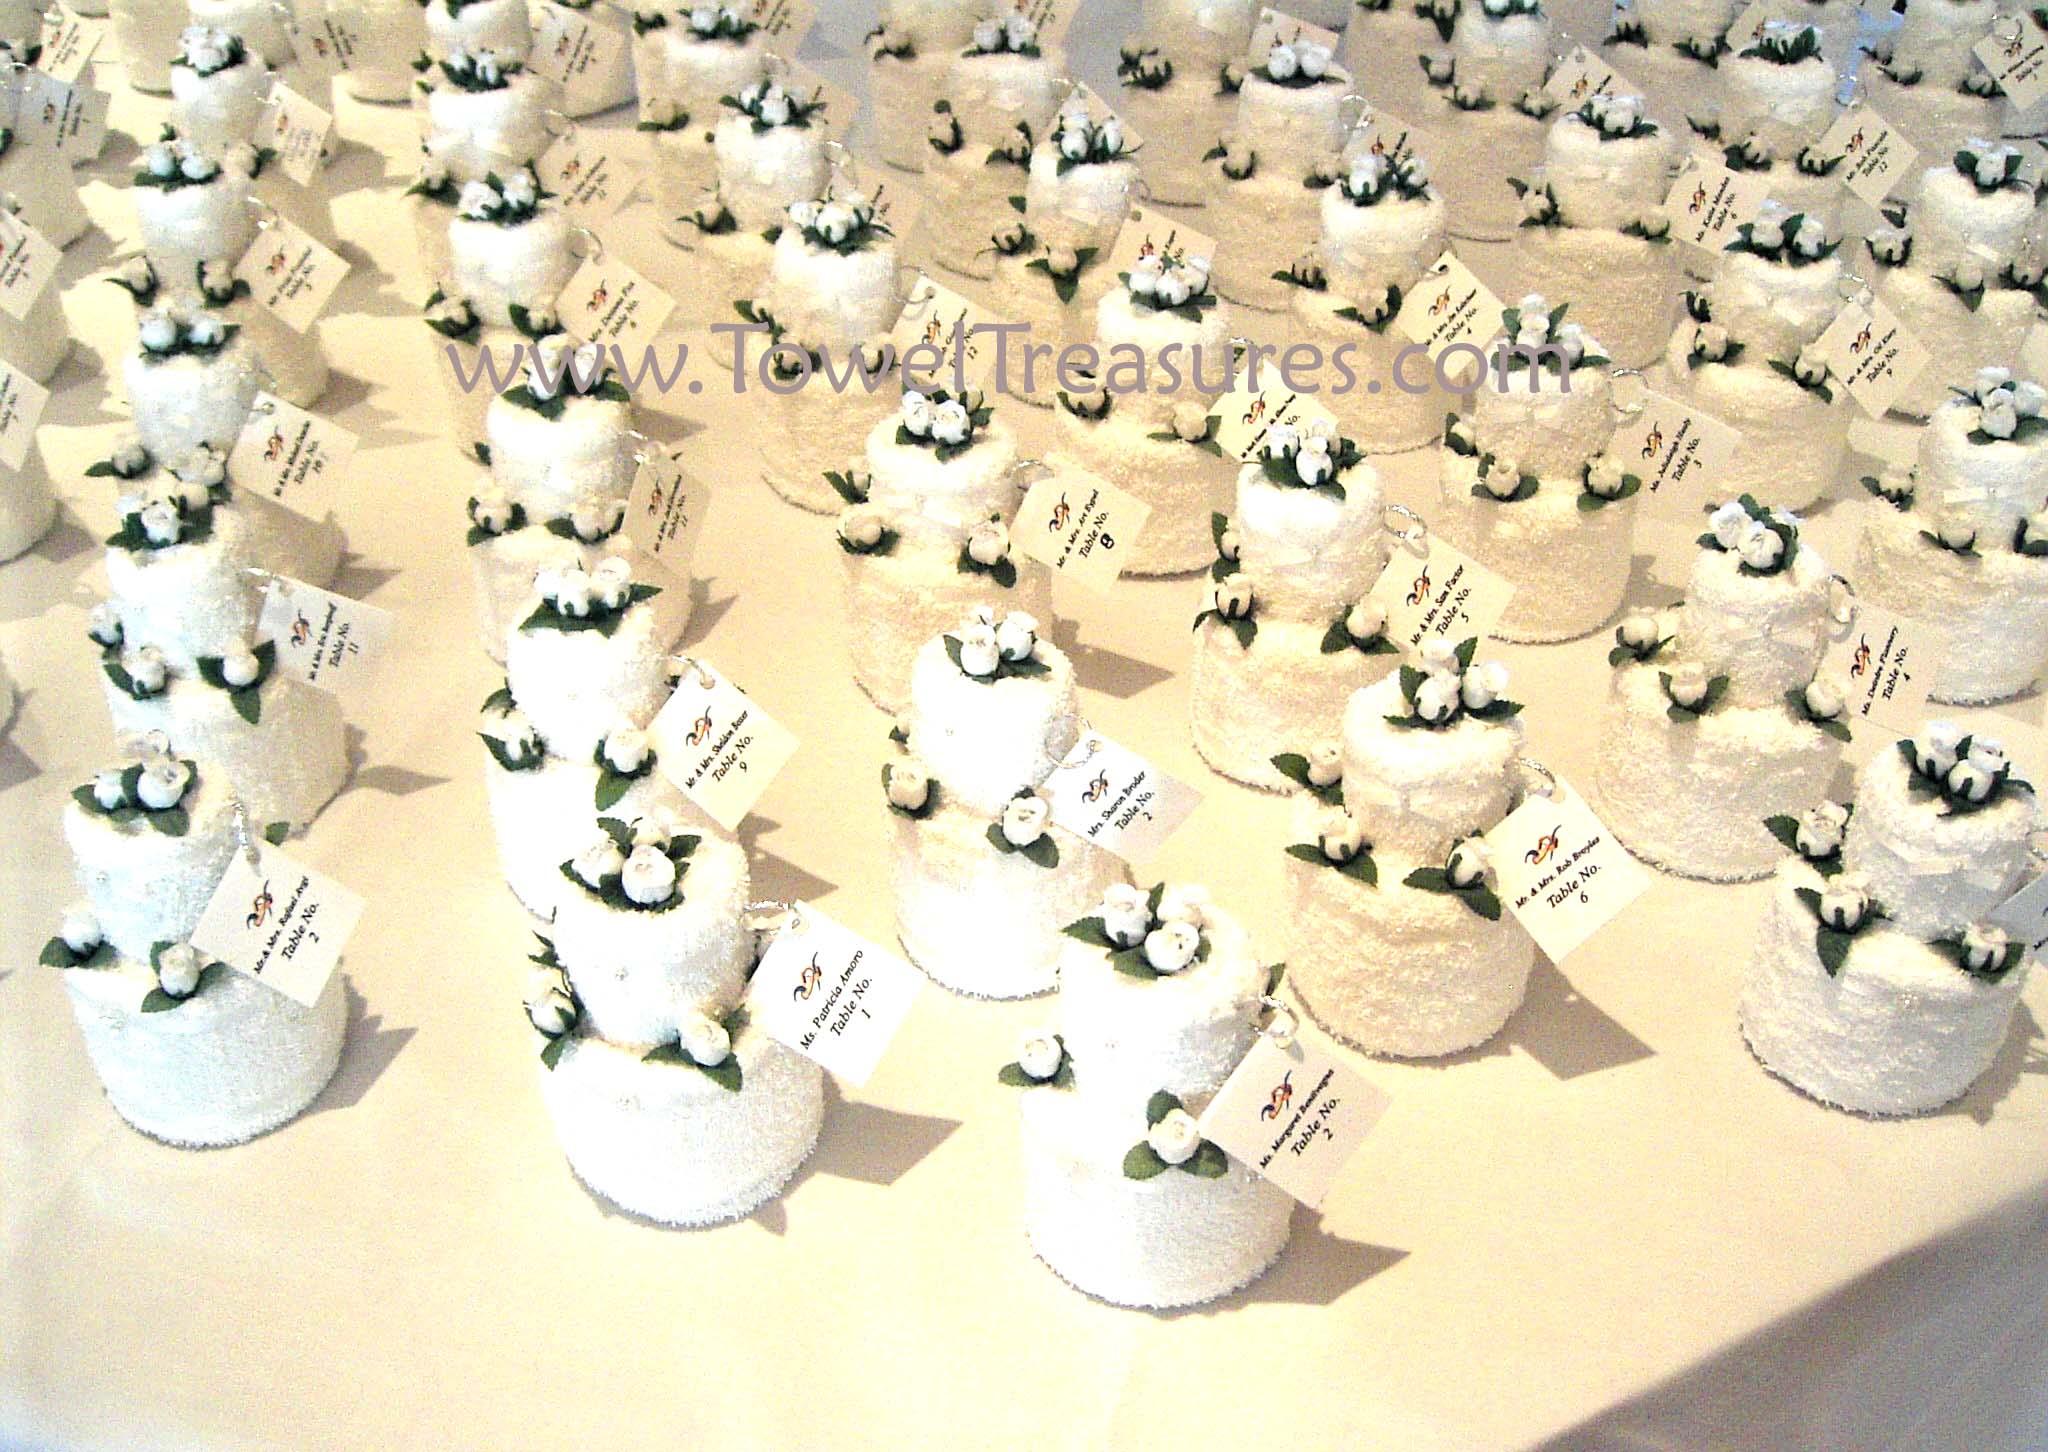 unusual wedding gift ideas wedding gifts for guests unusual wedding gift ideas